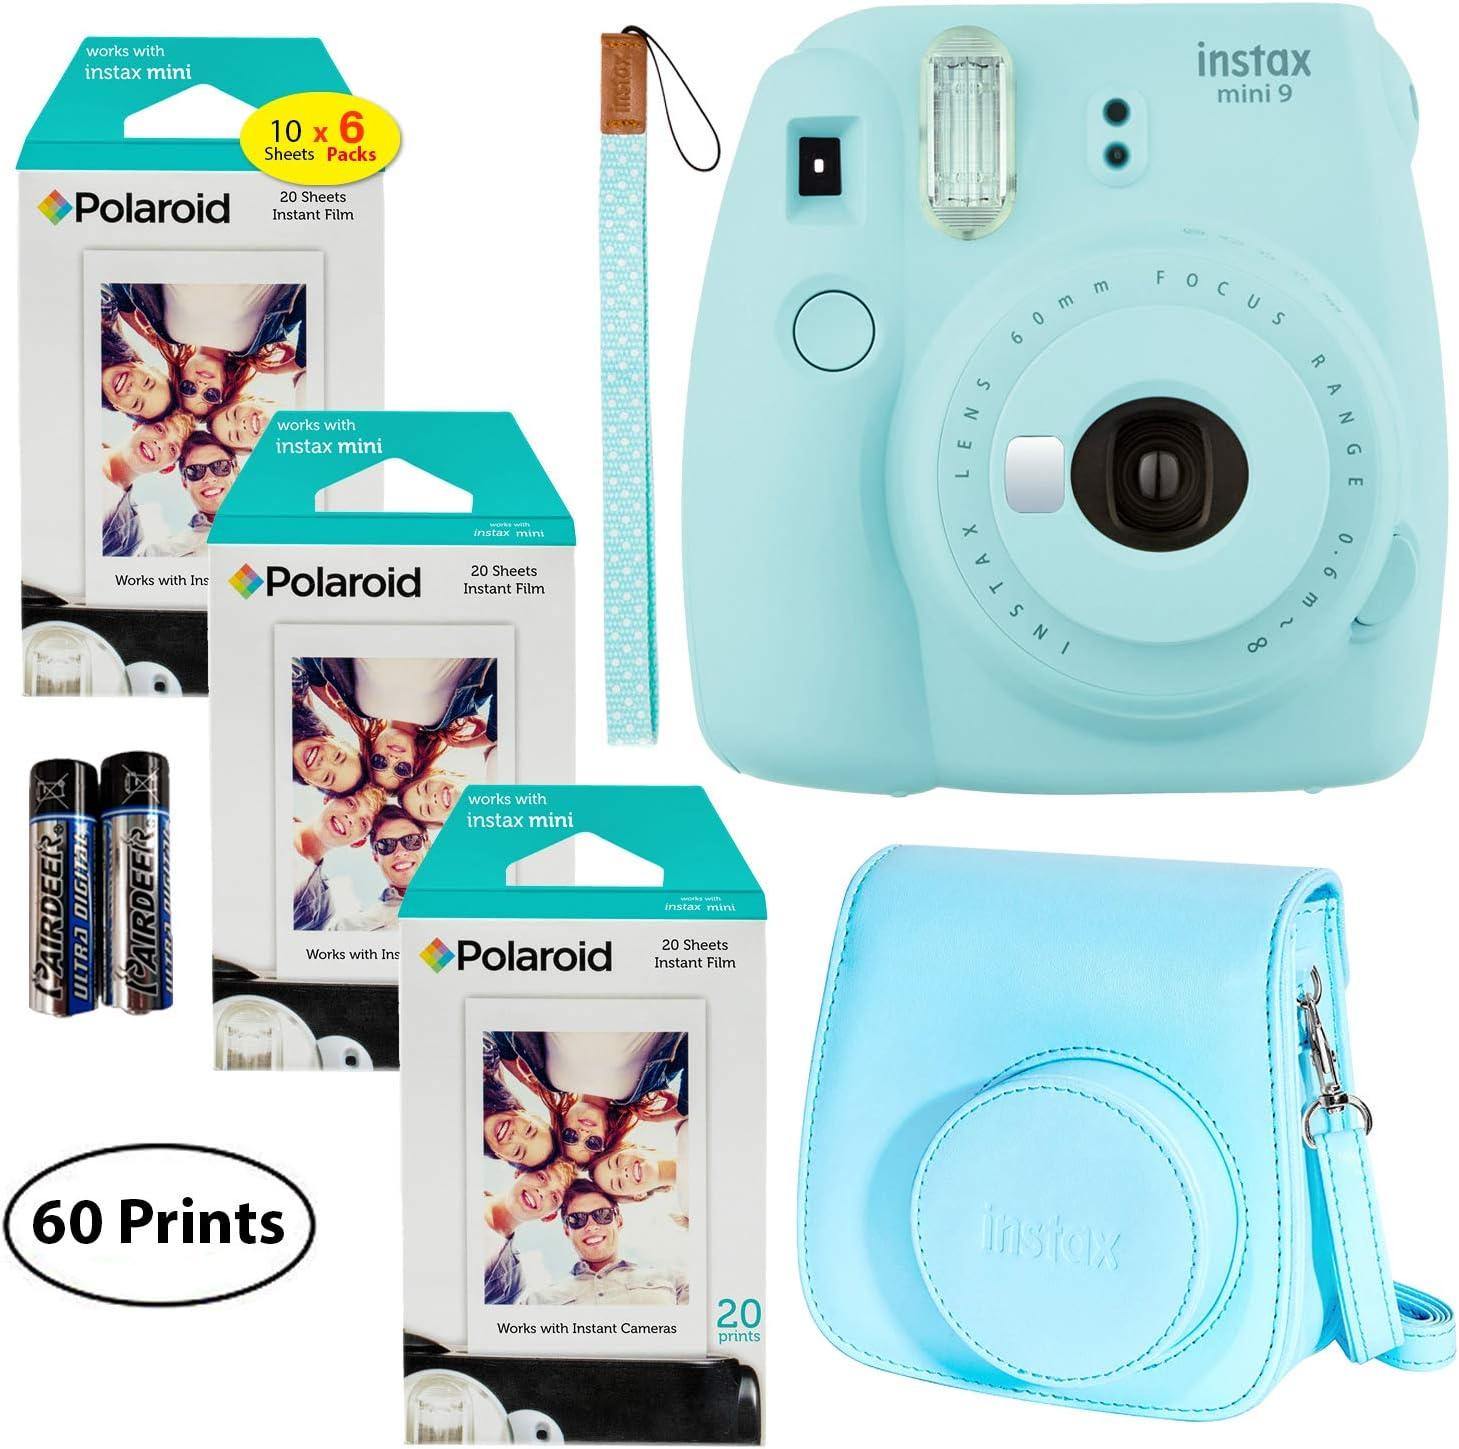 Fujifilm Instax Mini 9 Instant Camera (Ice Blue),6 x Packs 10 Prints Instant Film (60 Sheets) and Fuji Groovy Case (Blue) Bundle